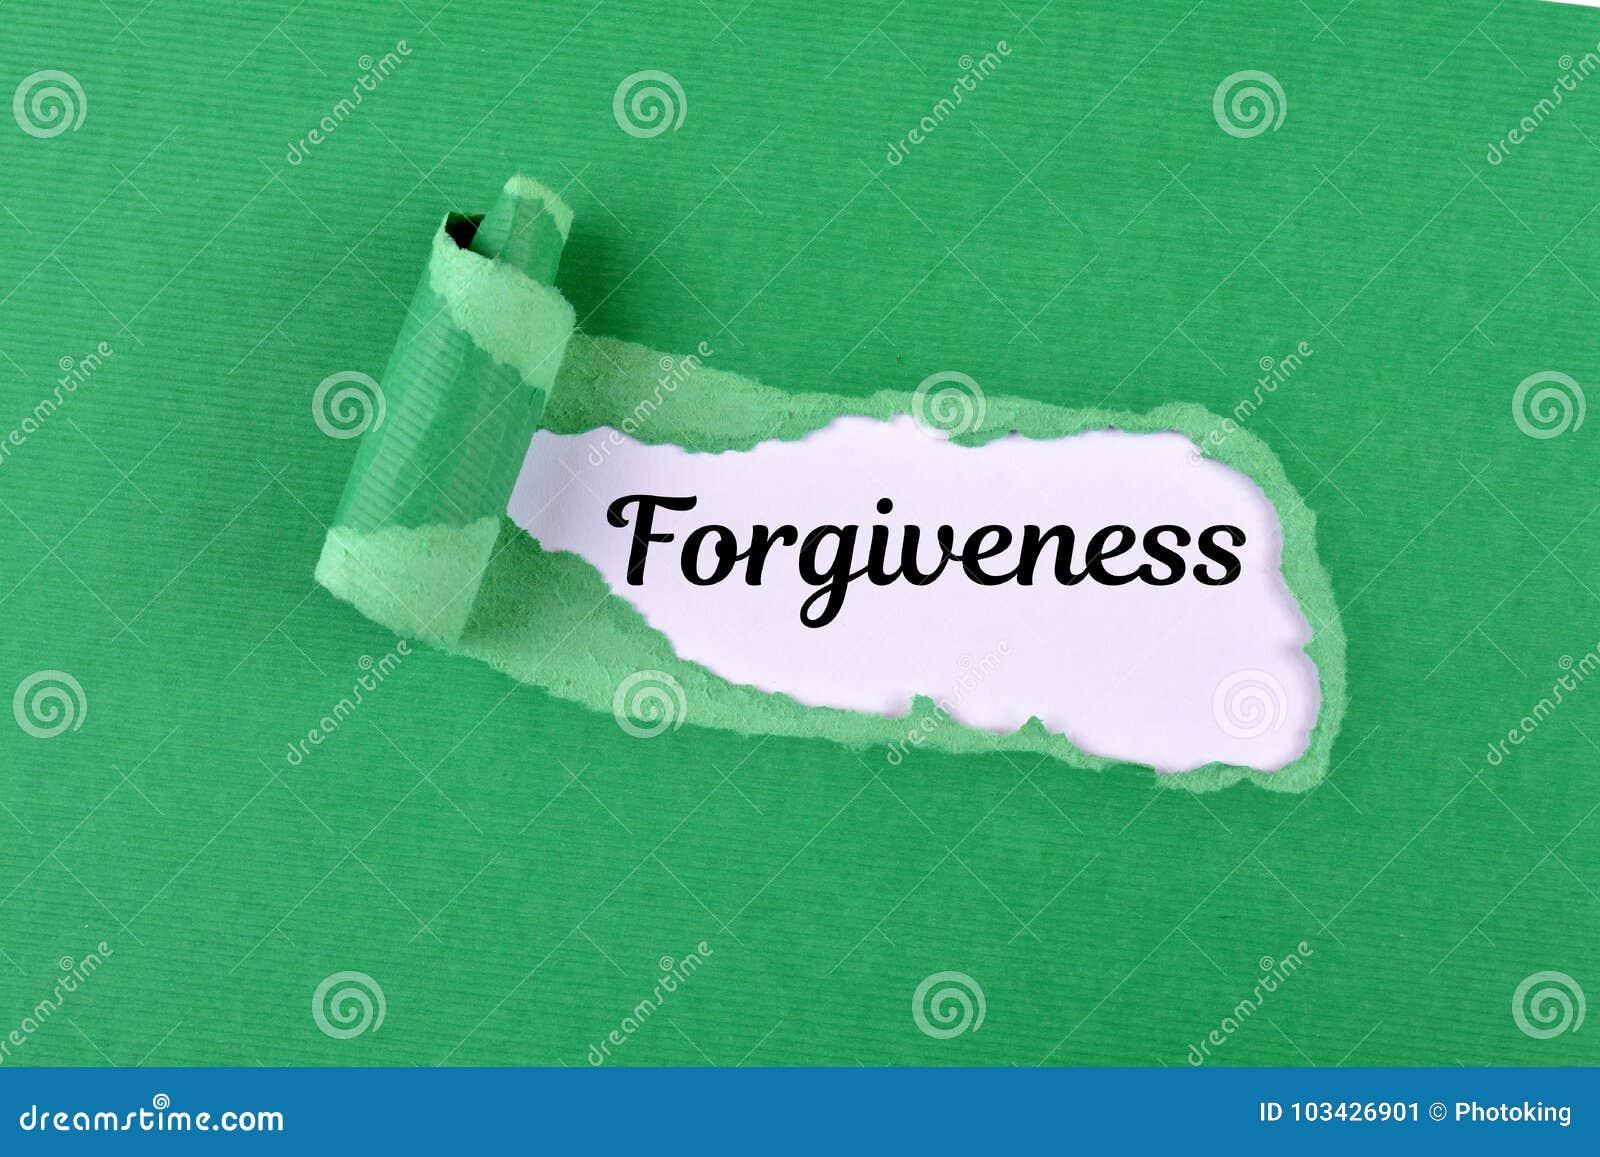 Forgiveness word